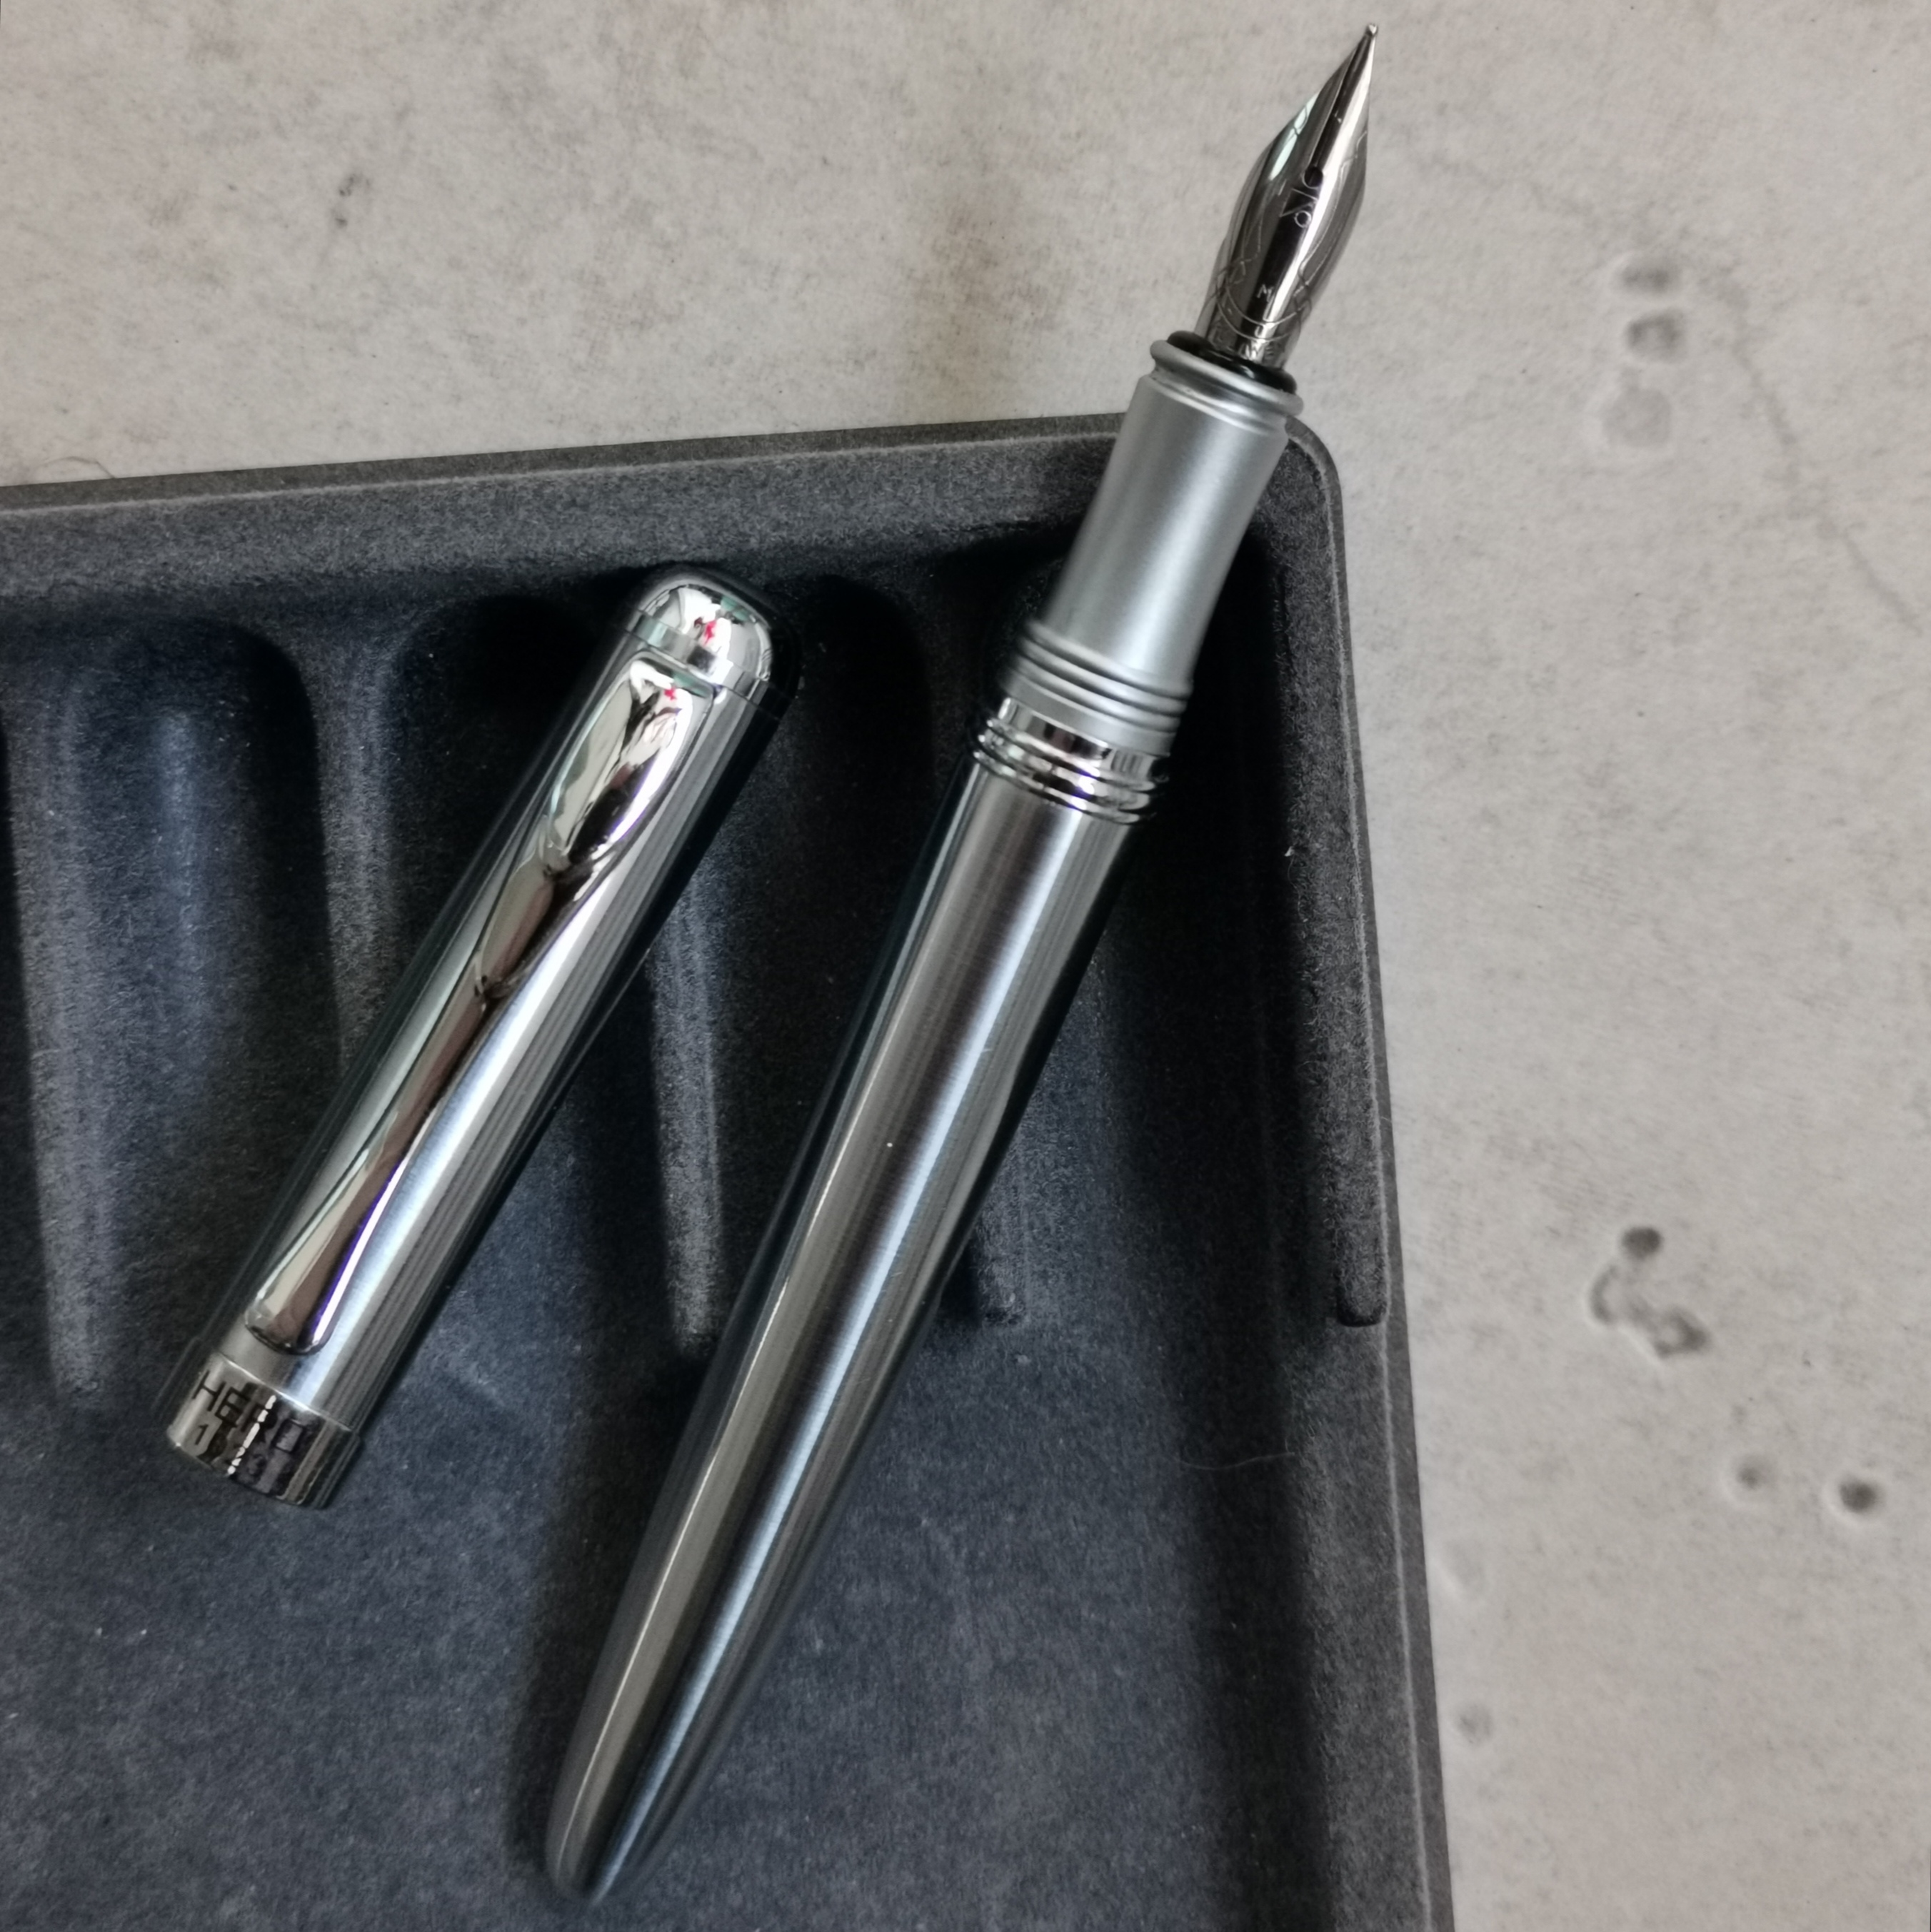 Old Stock Hero 1023 Fountain Pen Steel Ink Pen M Nib 2008S Stock Stationery Office school supplies